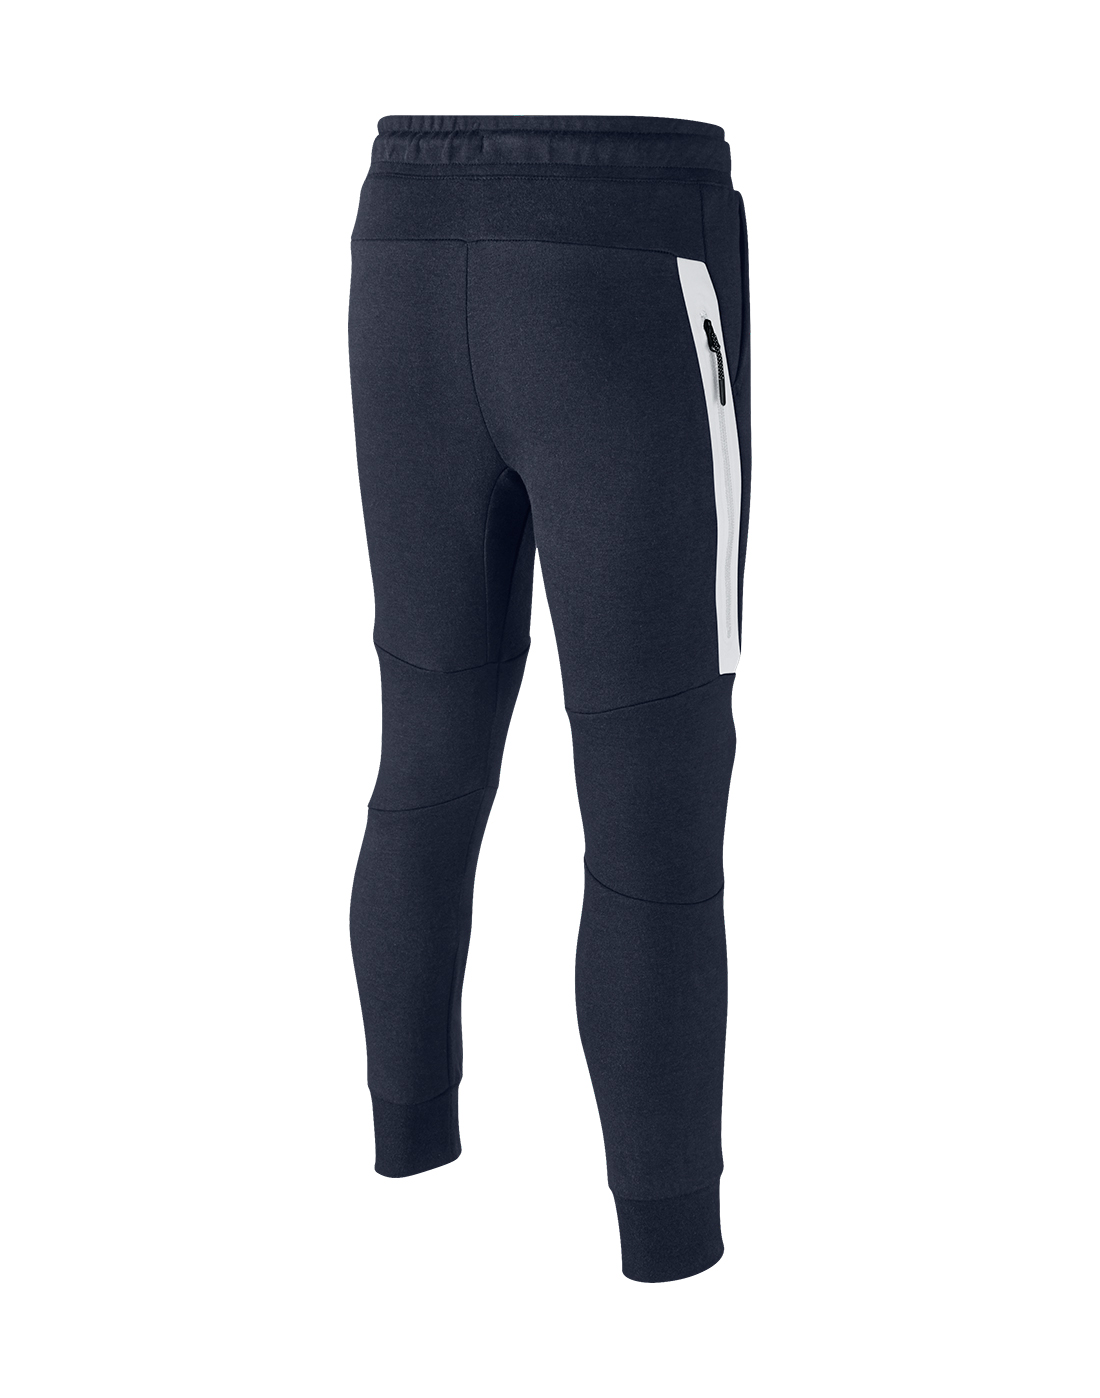 762ef897a303 Older Boys Tech Fleece Pant · Older Boys Tech Fleece Pant